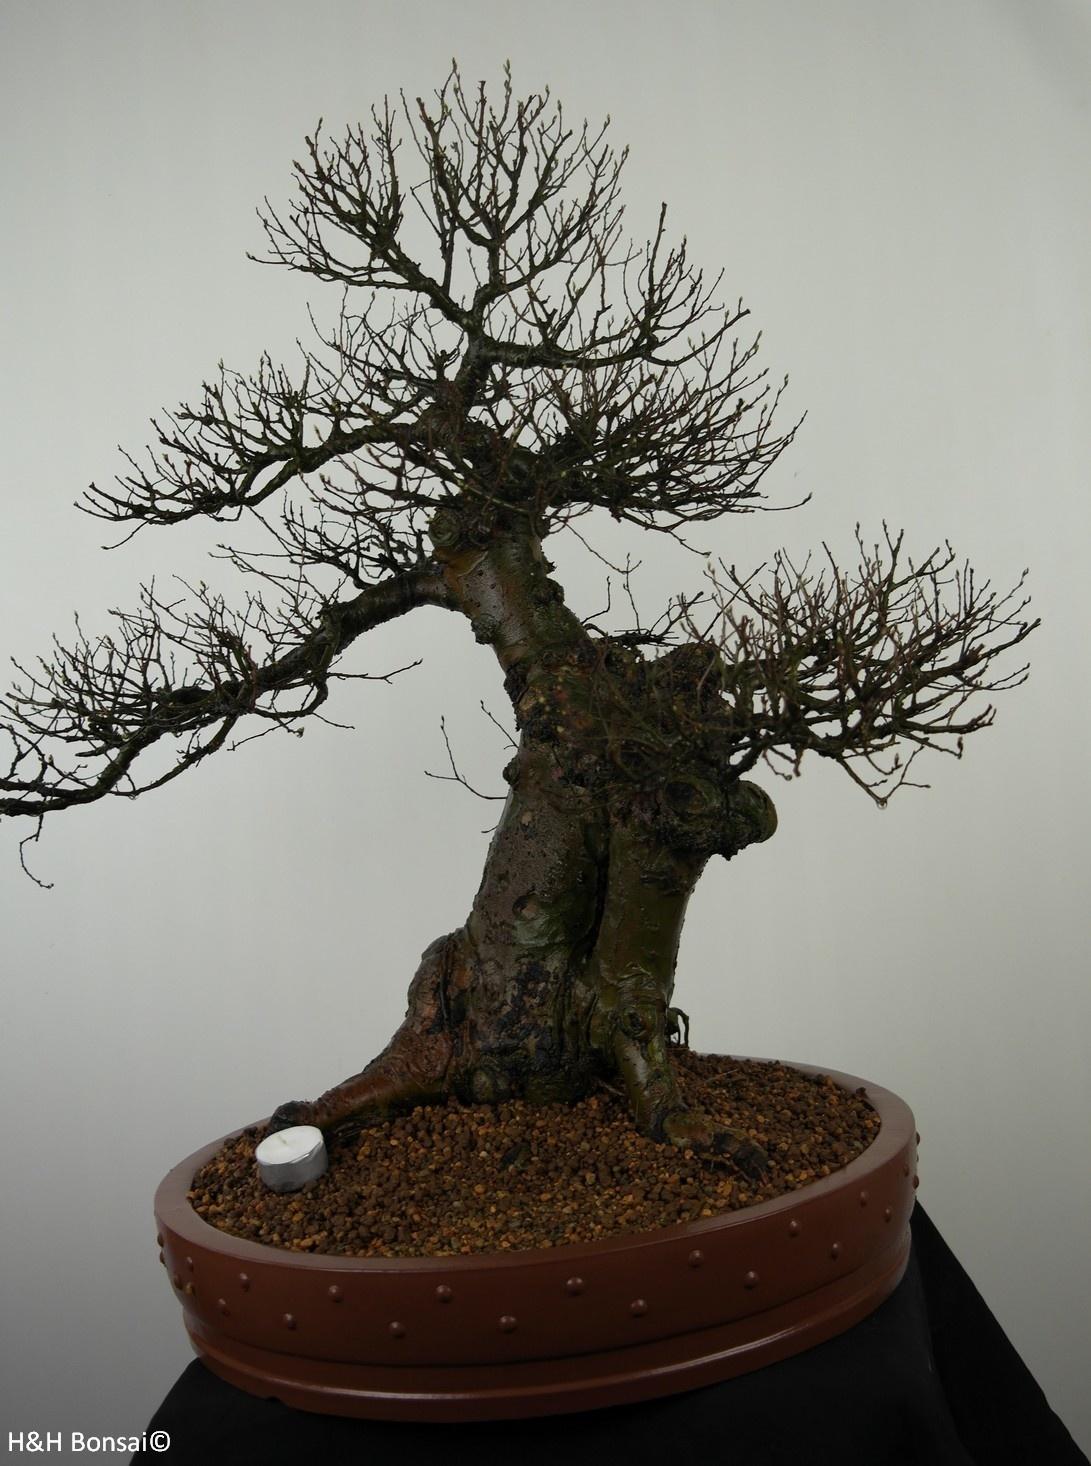 Bonsai Chinese Elm, Ulmus, no. 7519